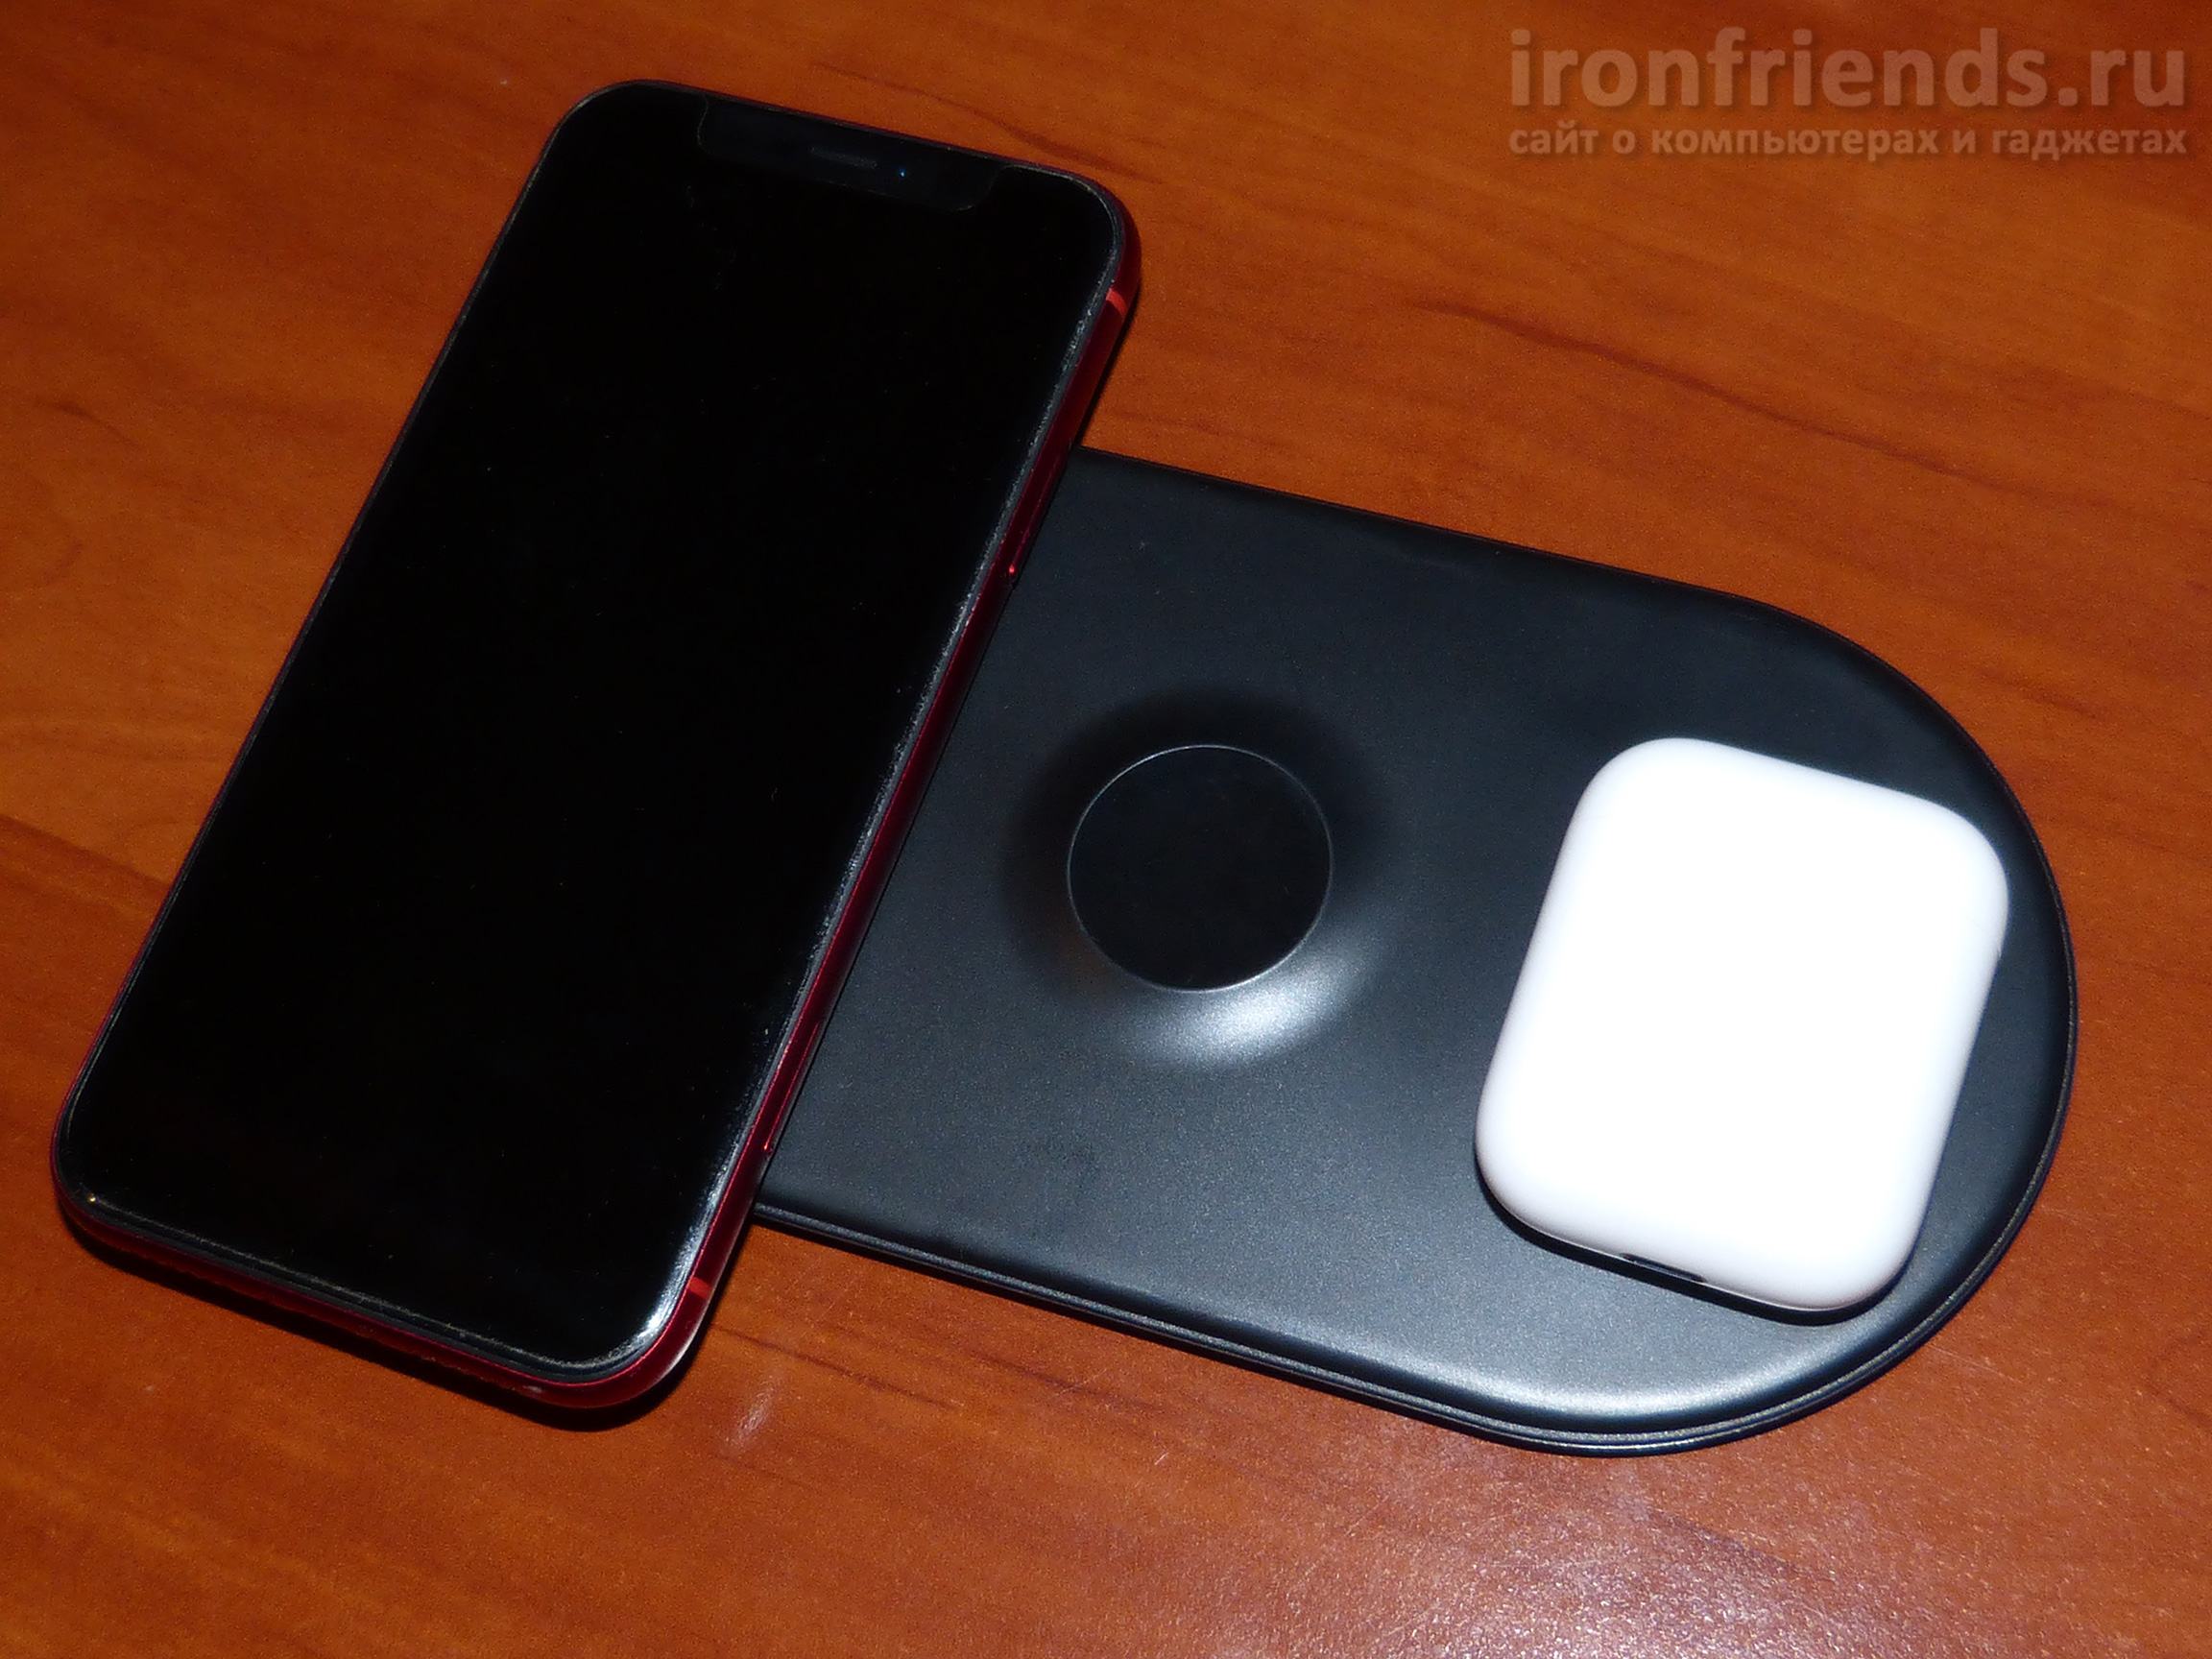 Тестирование Baseus Wireless Charger 3 in 1 (BS-IW04)